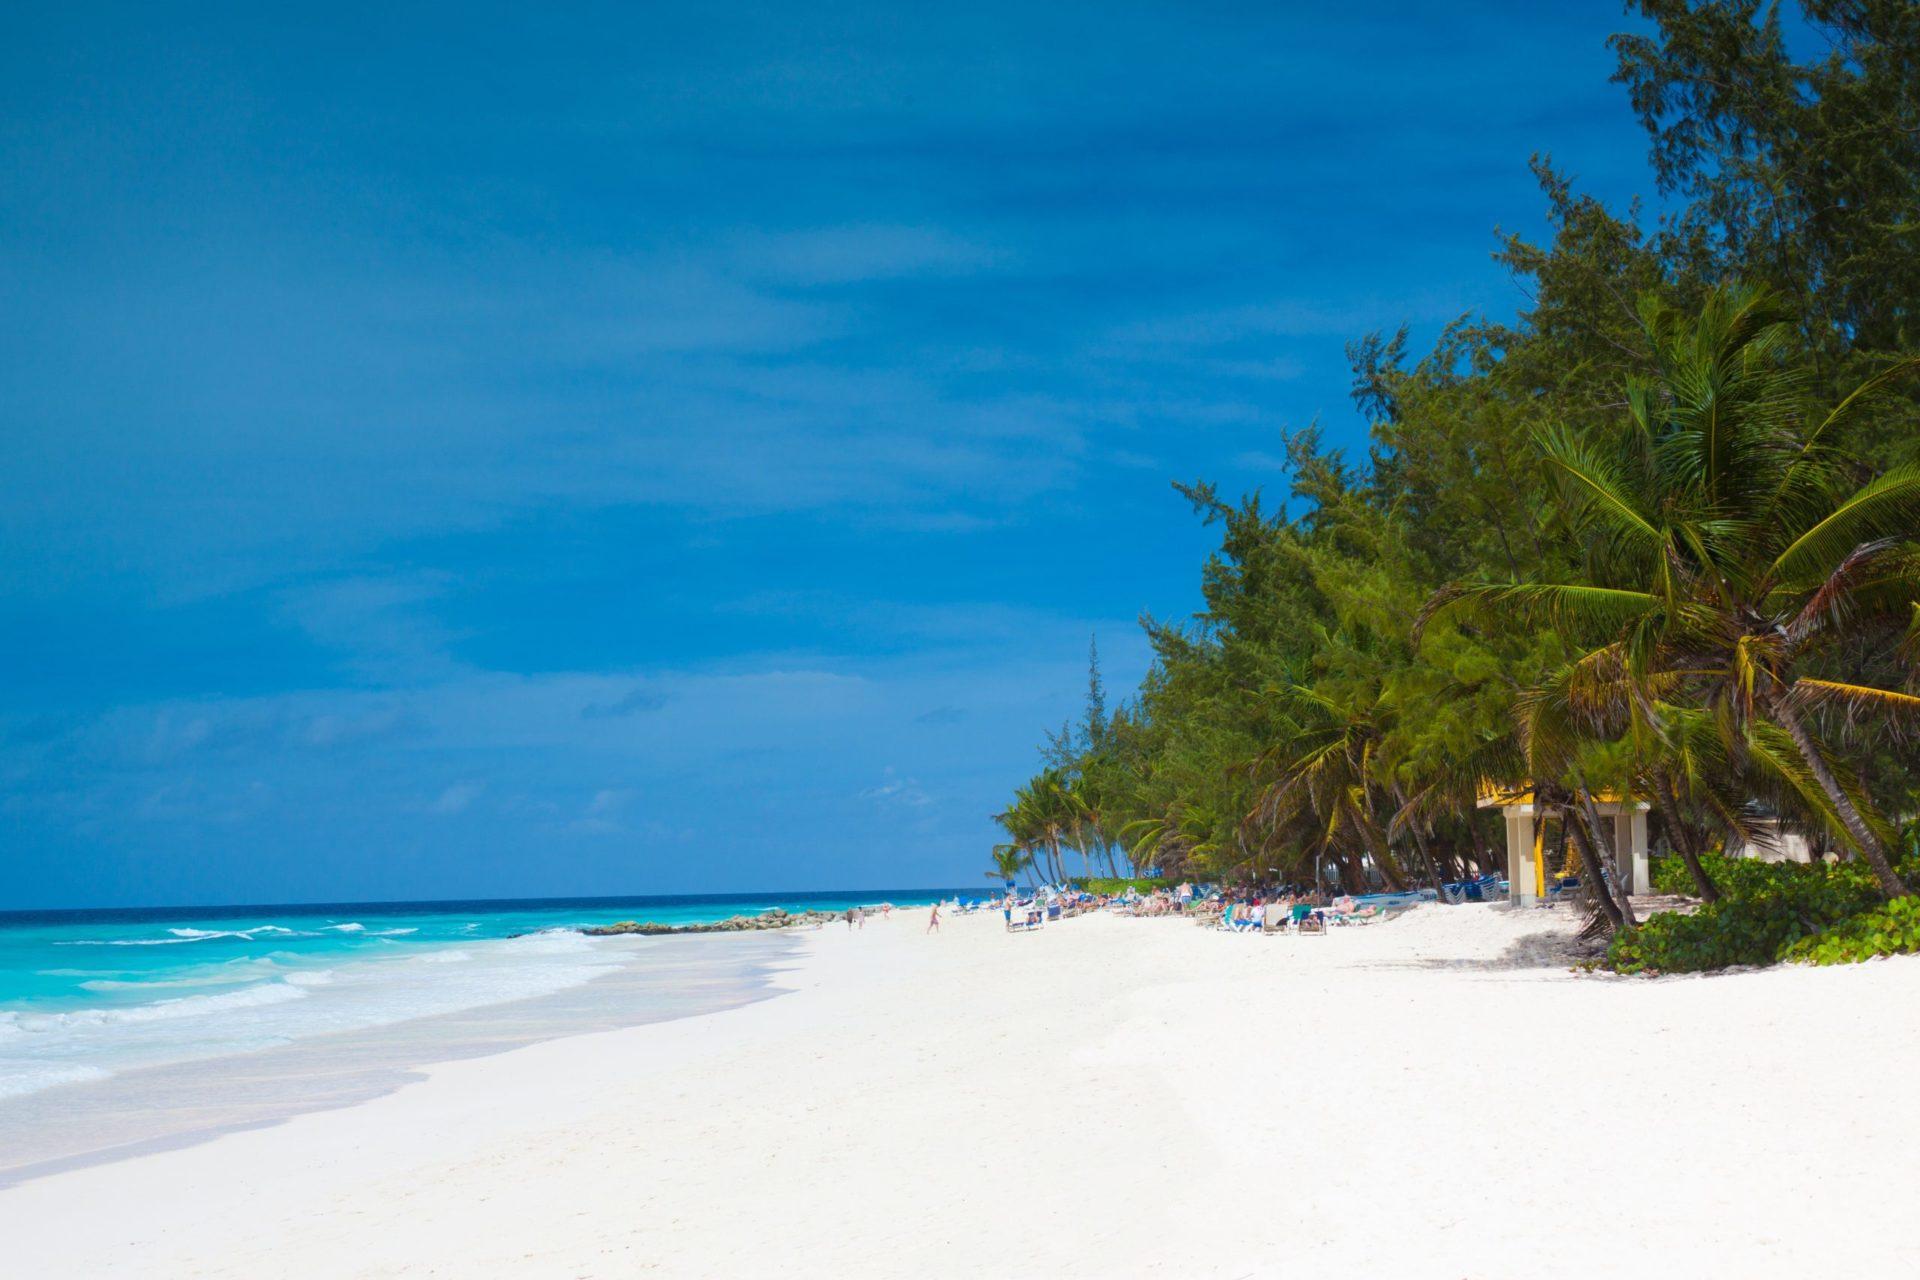 Wassertemperatur Barbados